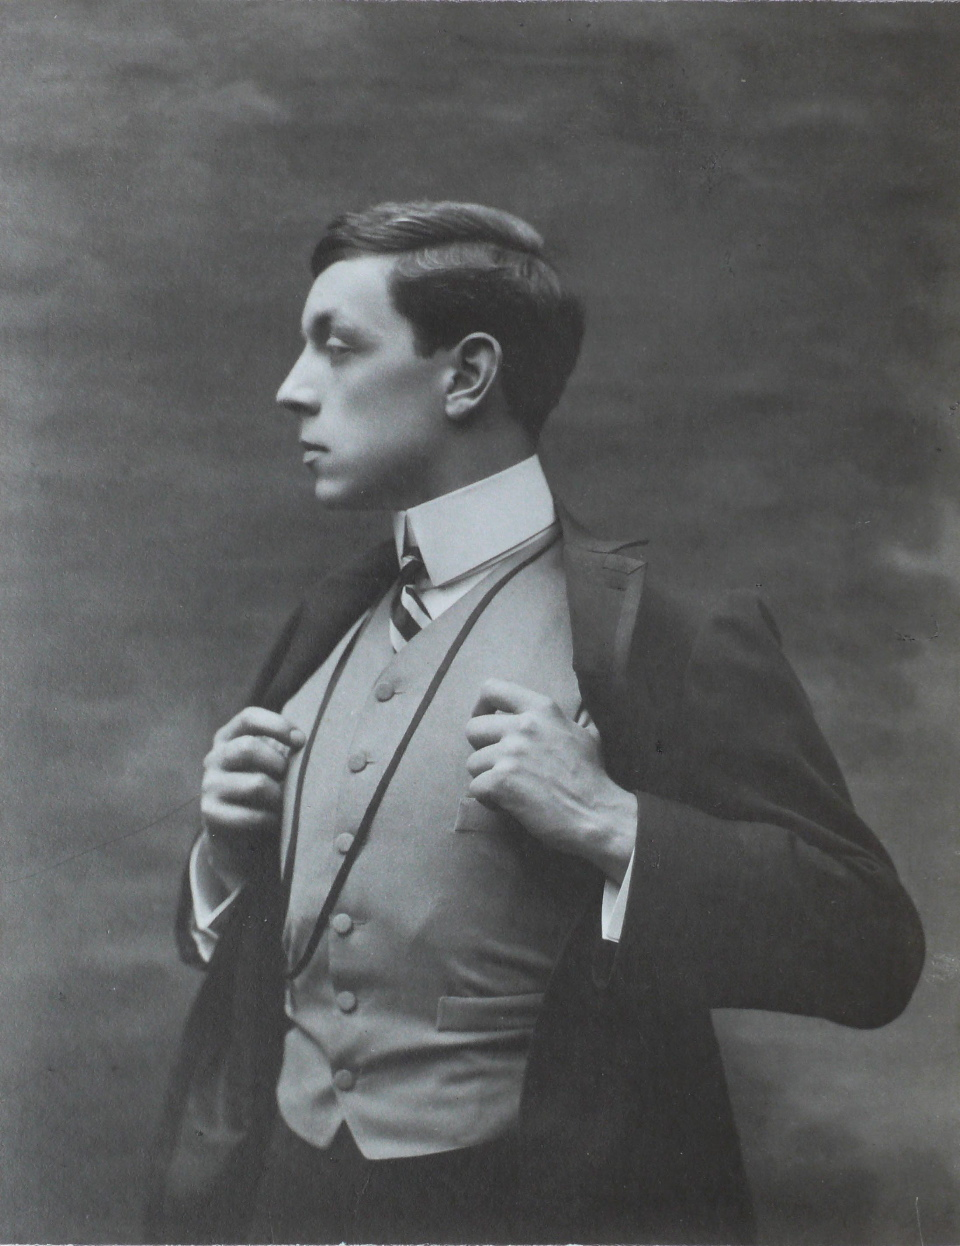 Roger Boutet de Monvel 1904